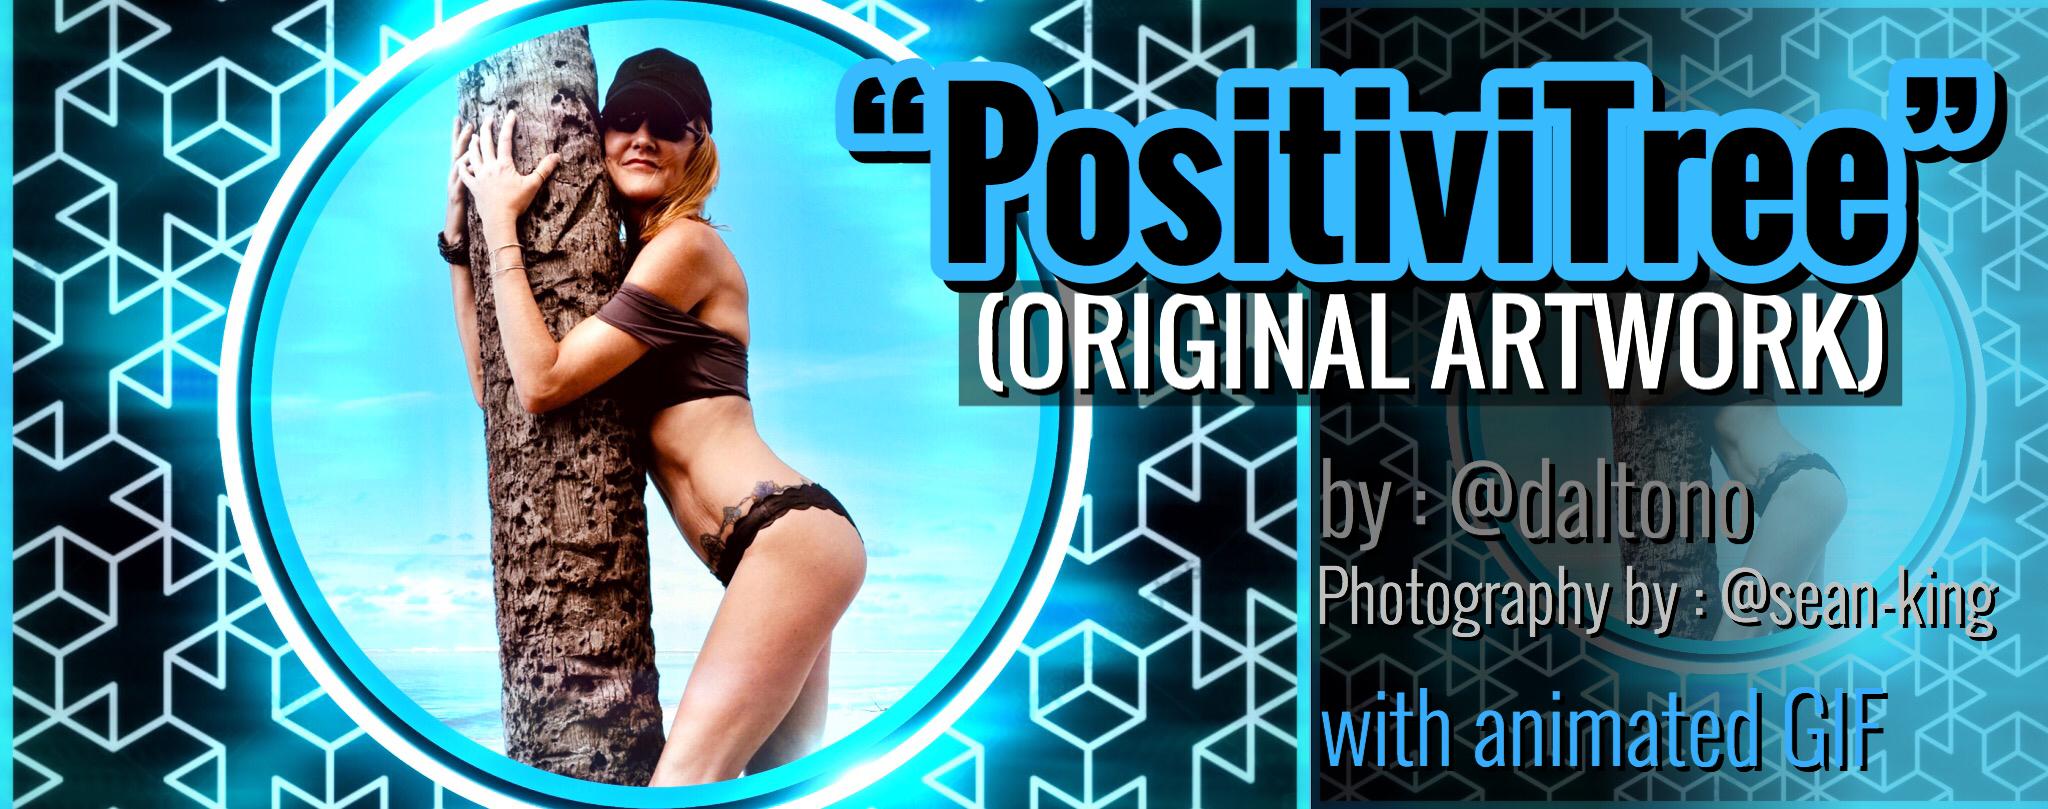 positivitree-thumbnail.JPG